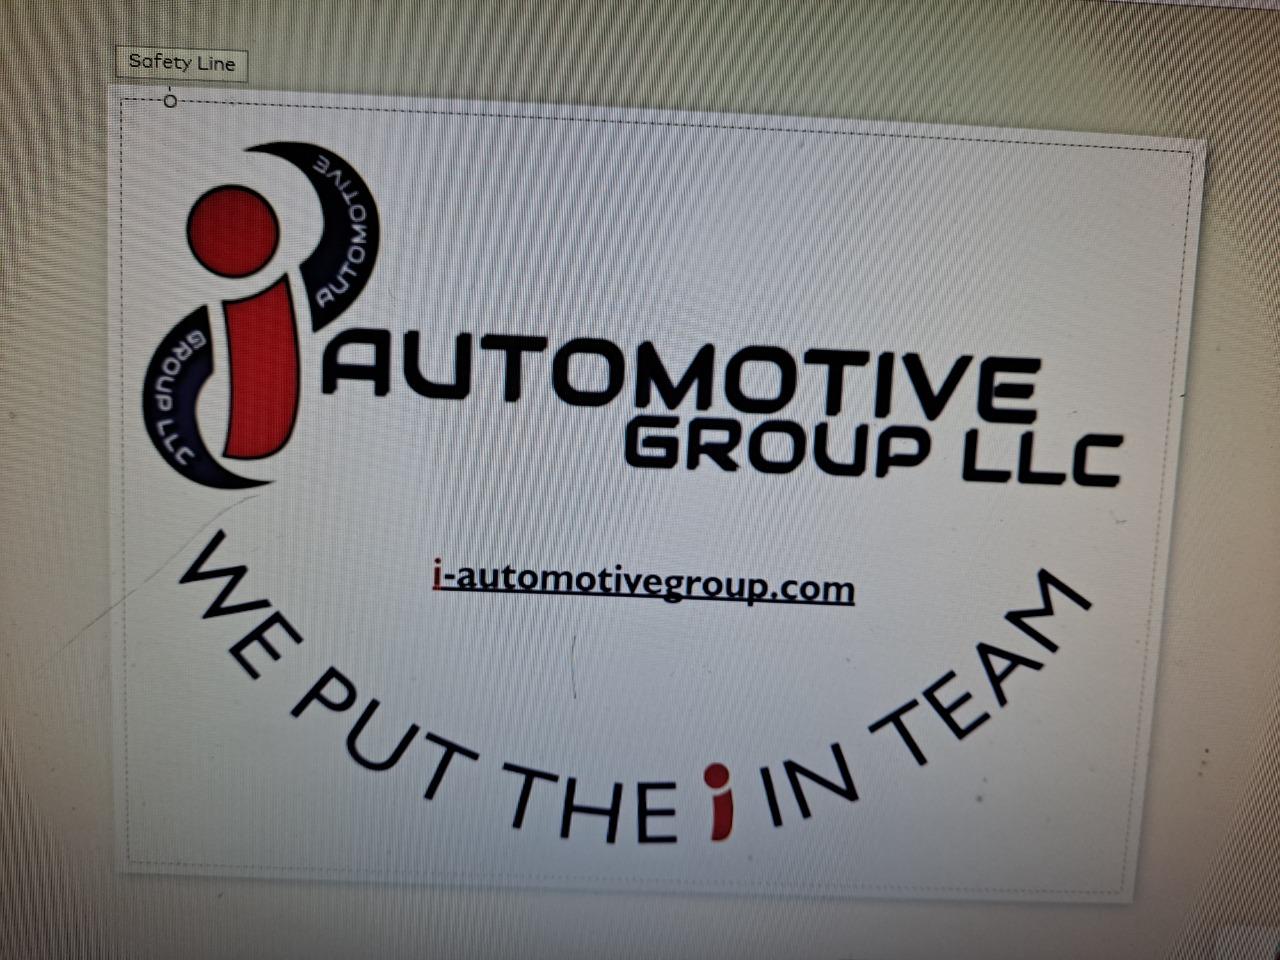 i-Automotive Group LLC